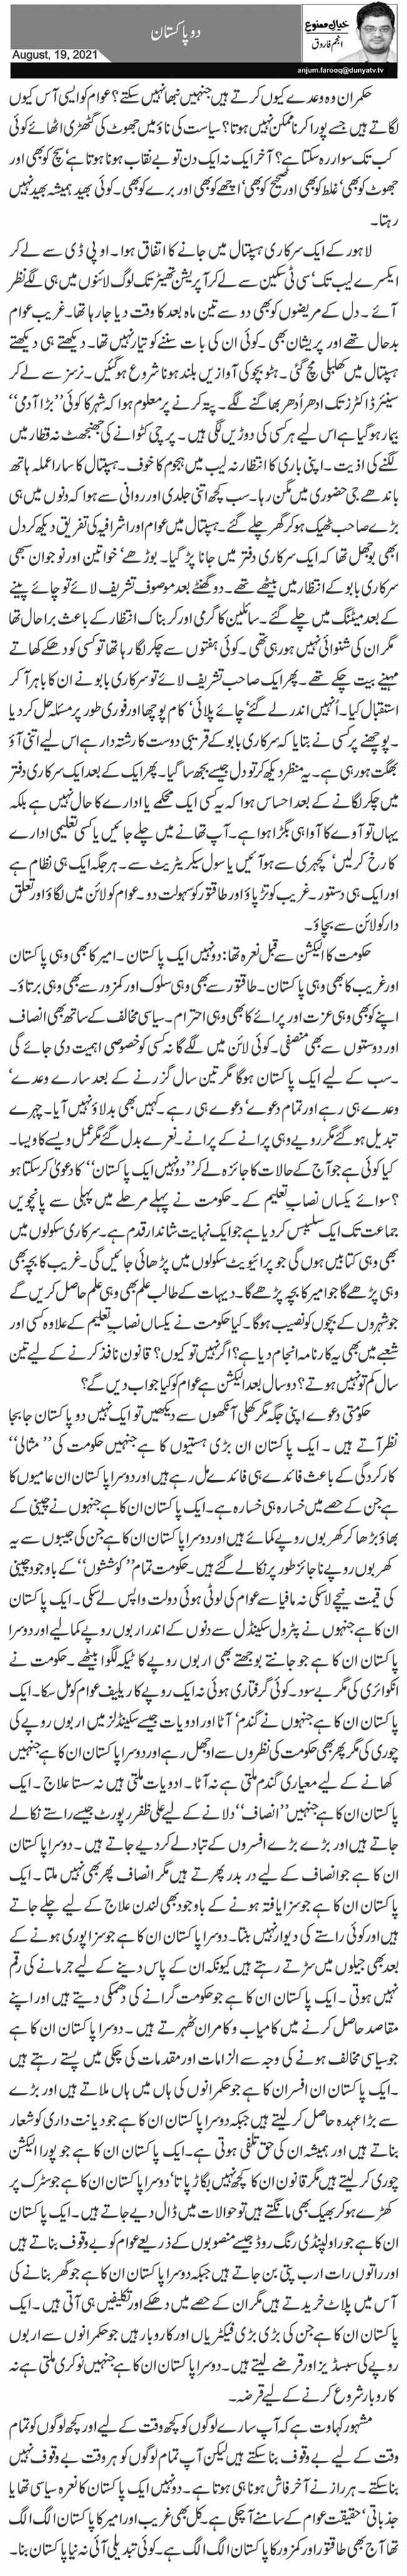 دو پاکستان